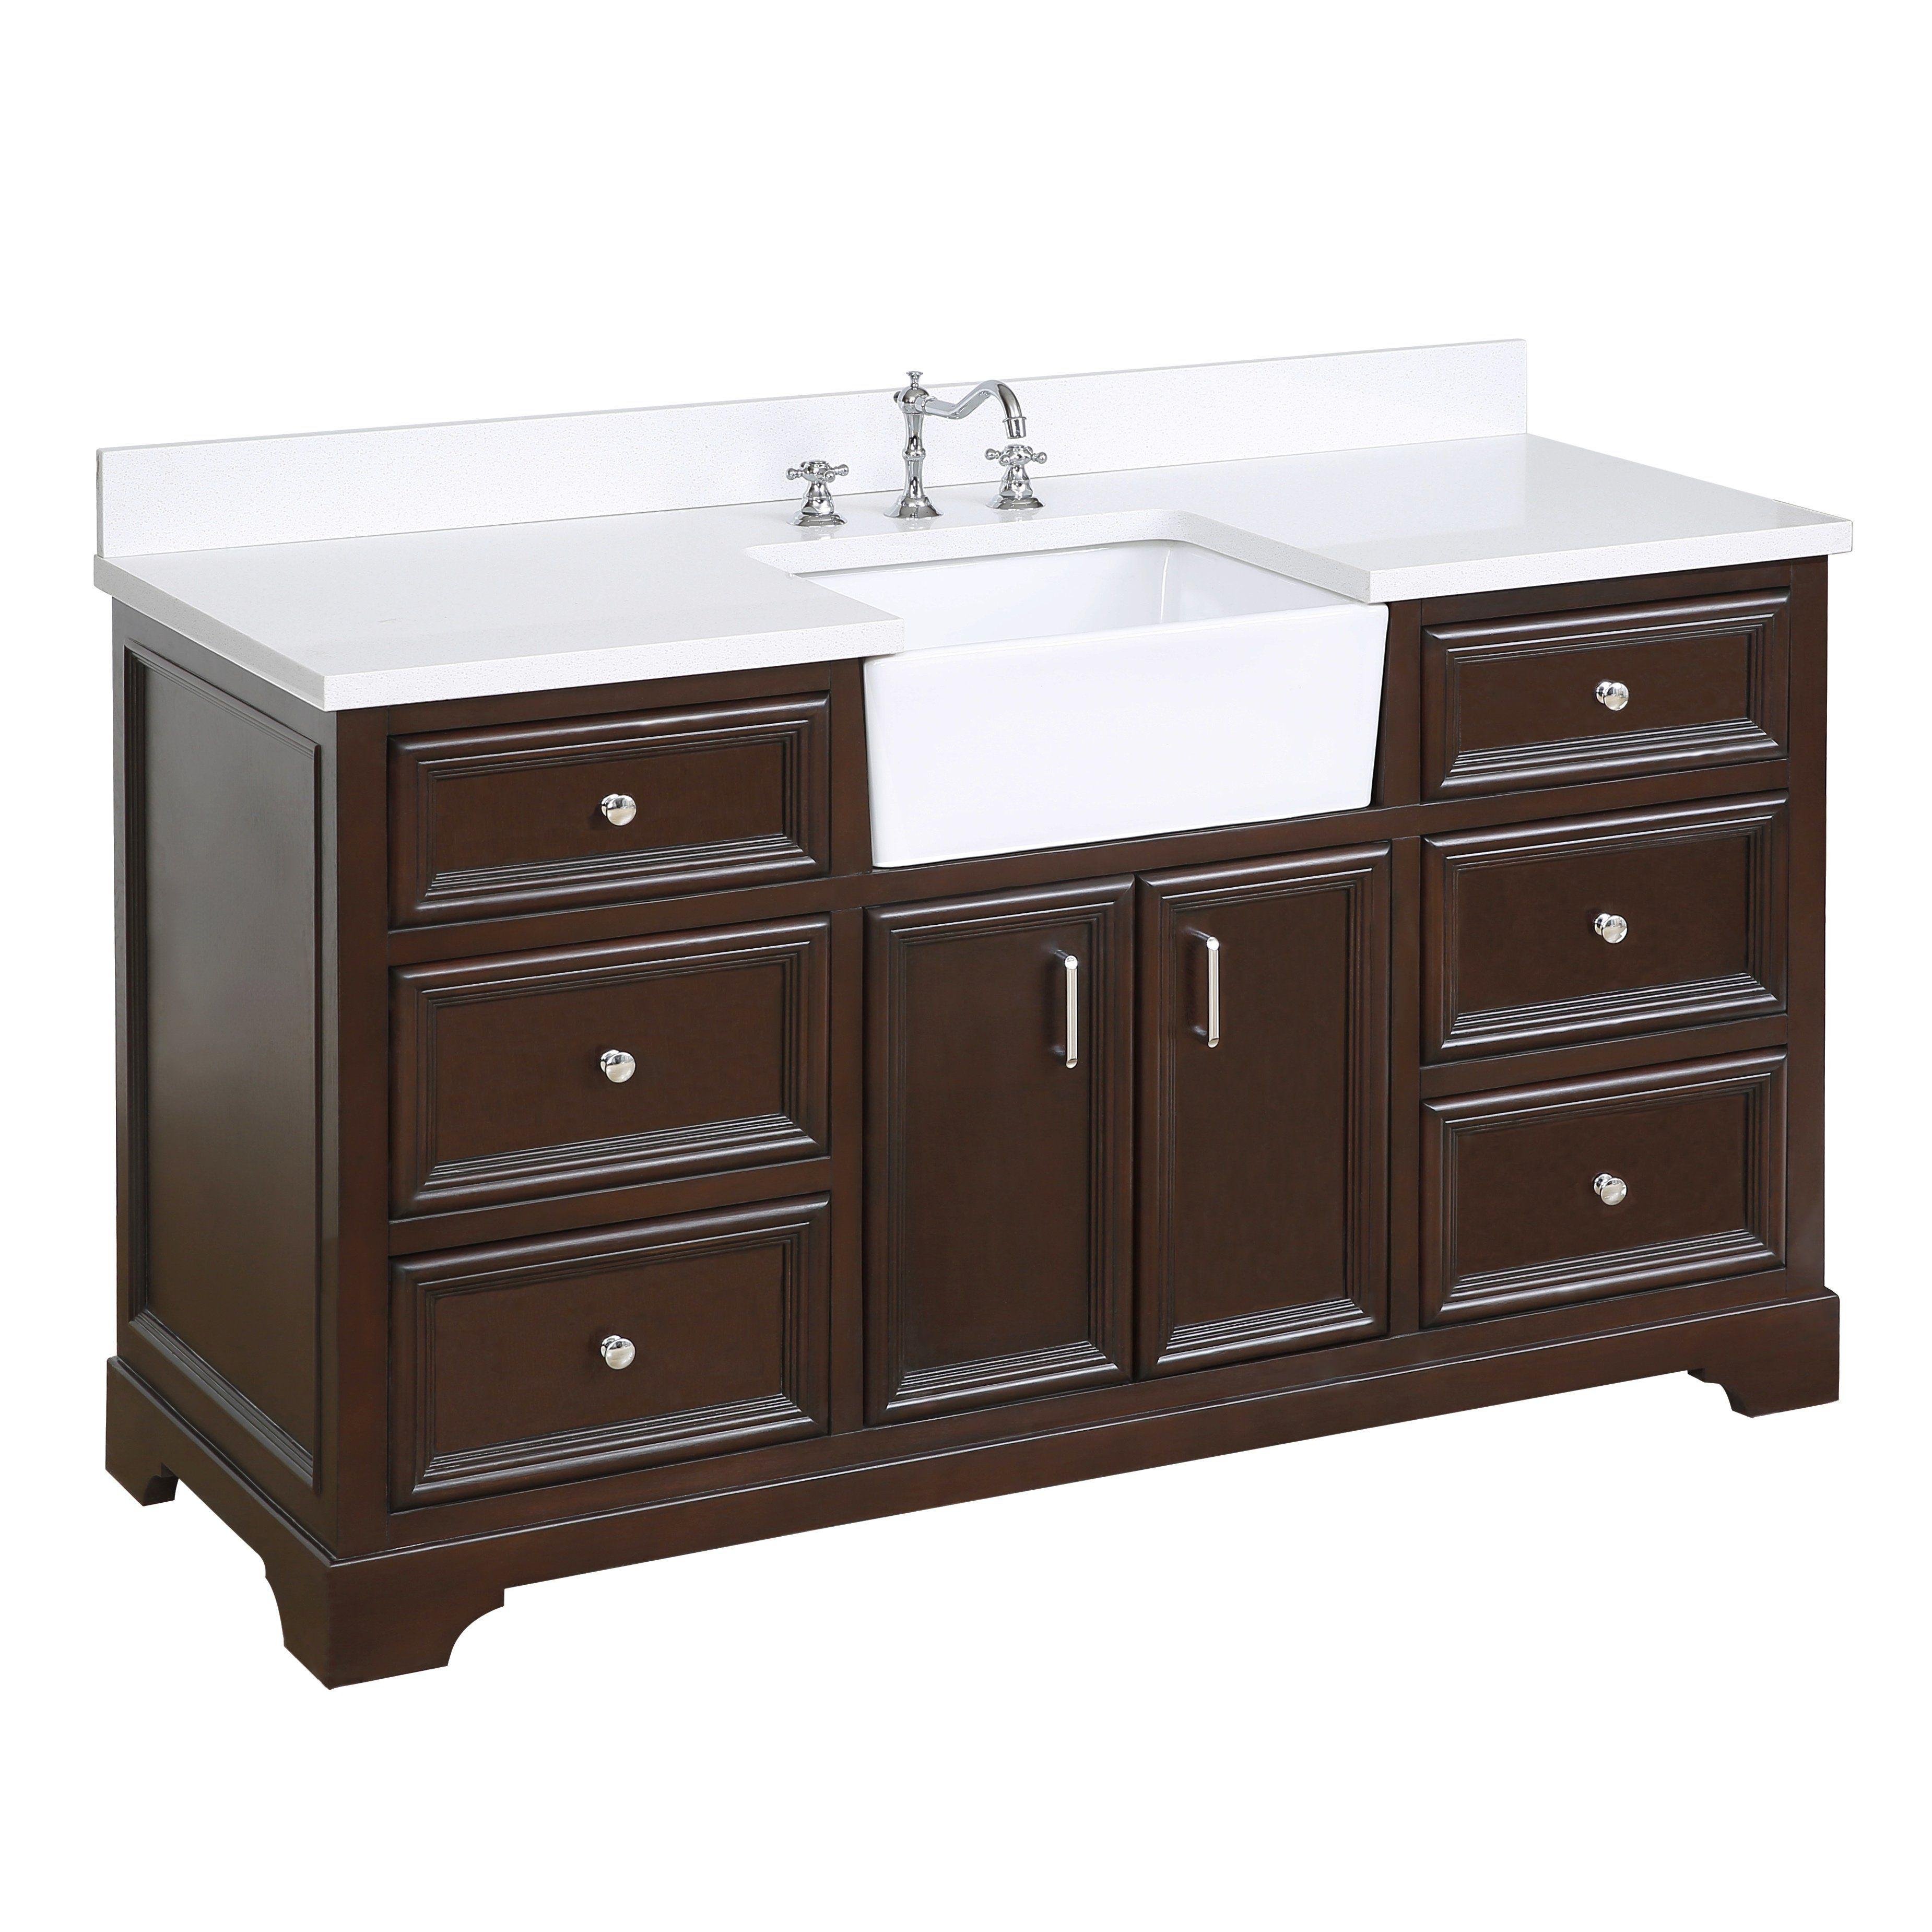 48 Inch Bathroom Vanity Farmhouse